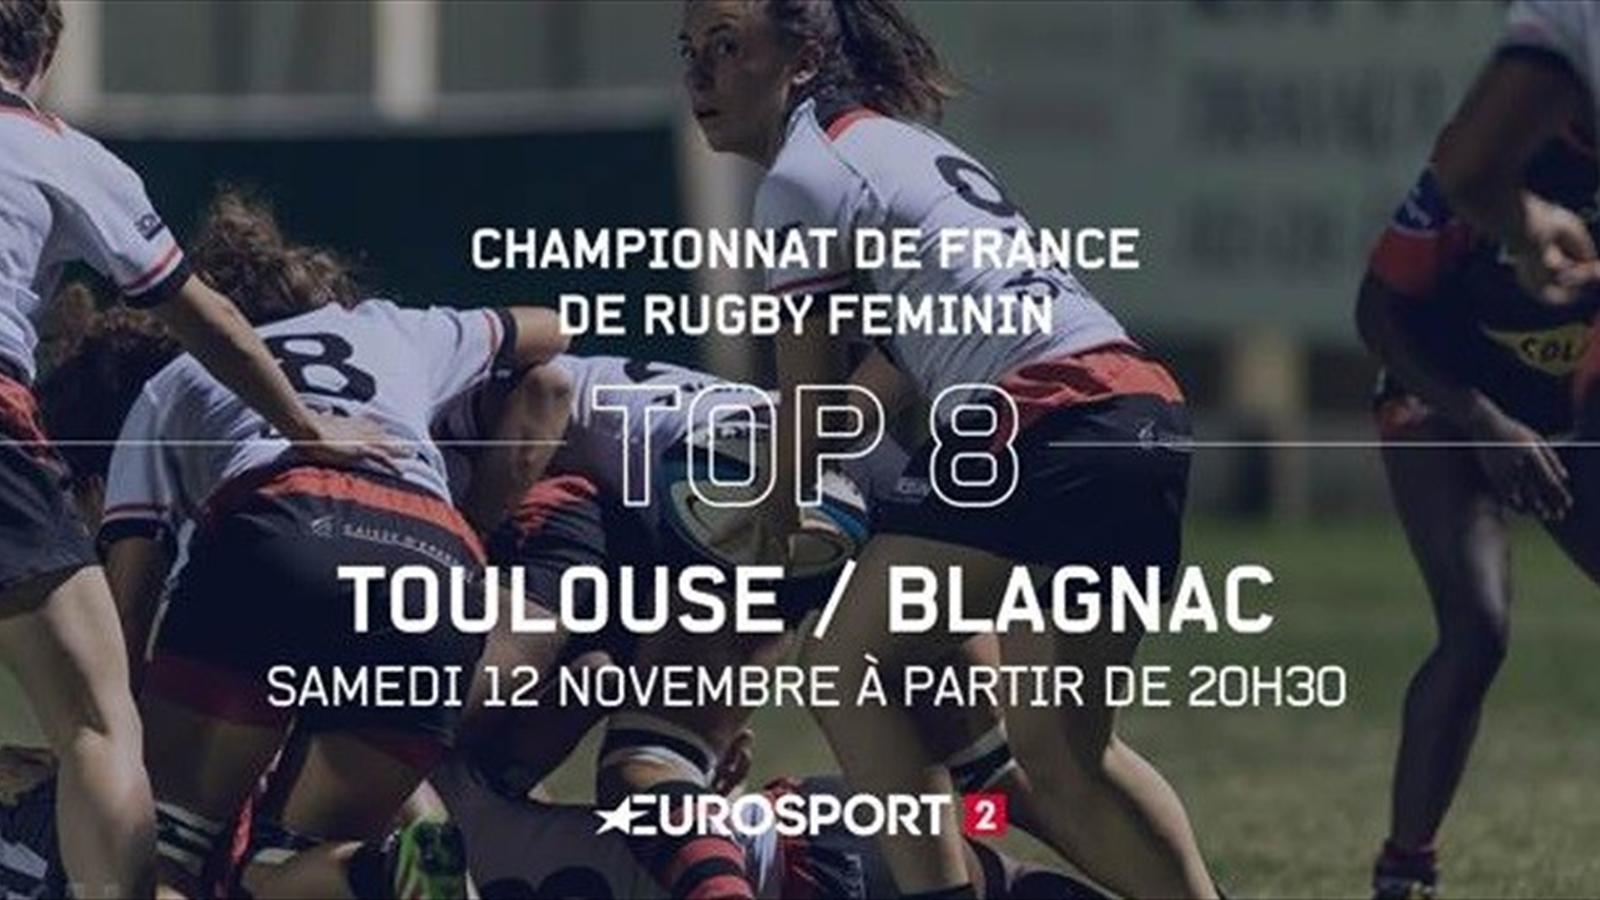 rugby f minin top 8 stade toulousain blagnac saint orens diffus sur eurosport 2 le 12. Black Bedroom Furniture Sets. Home Design Ideas